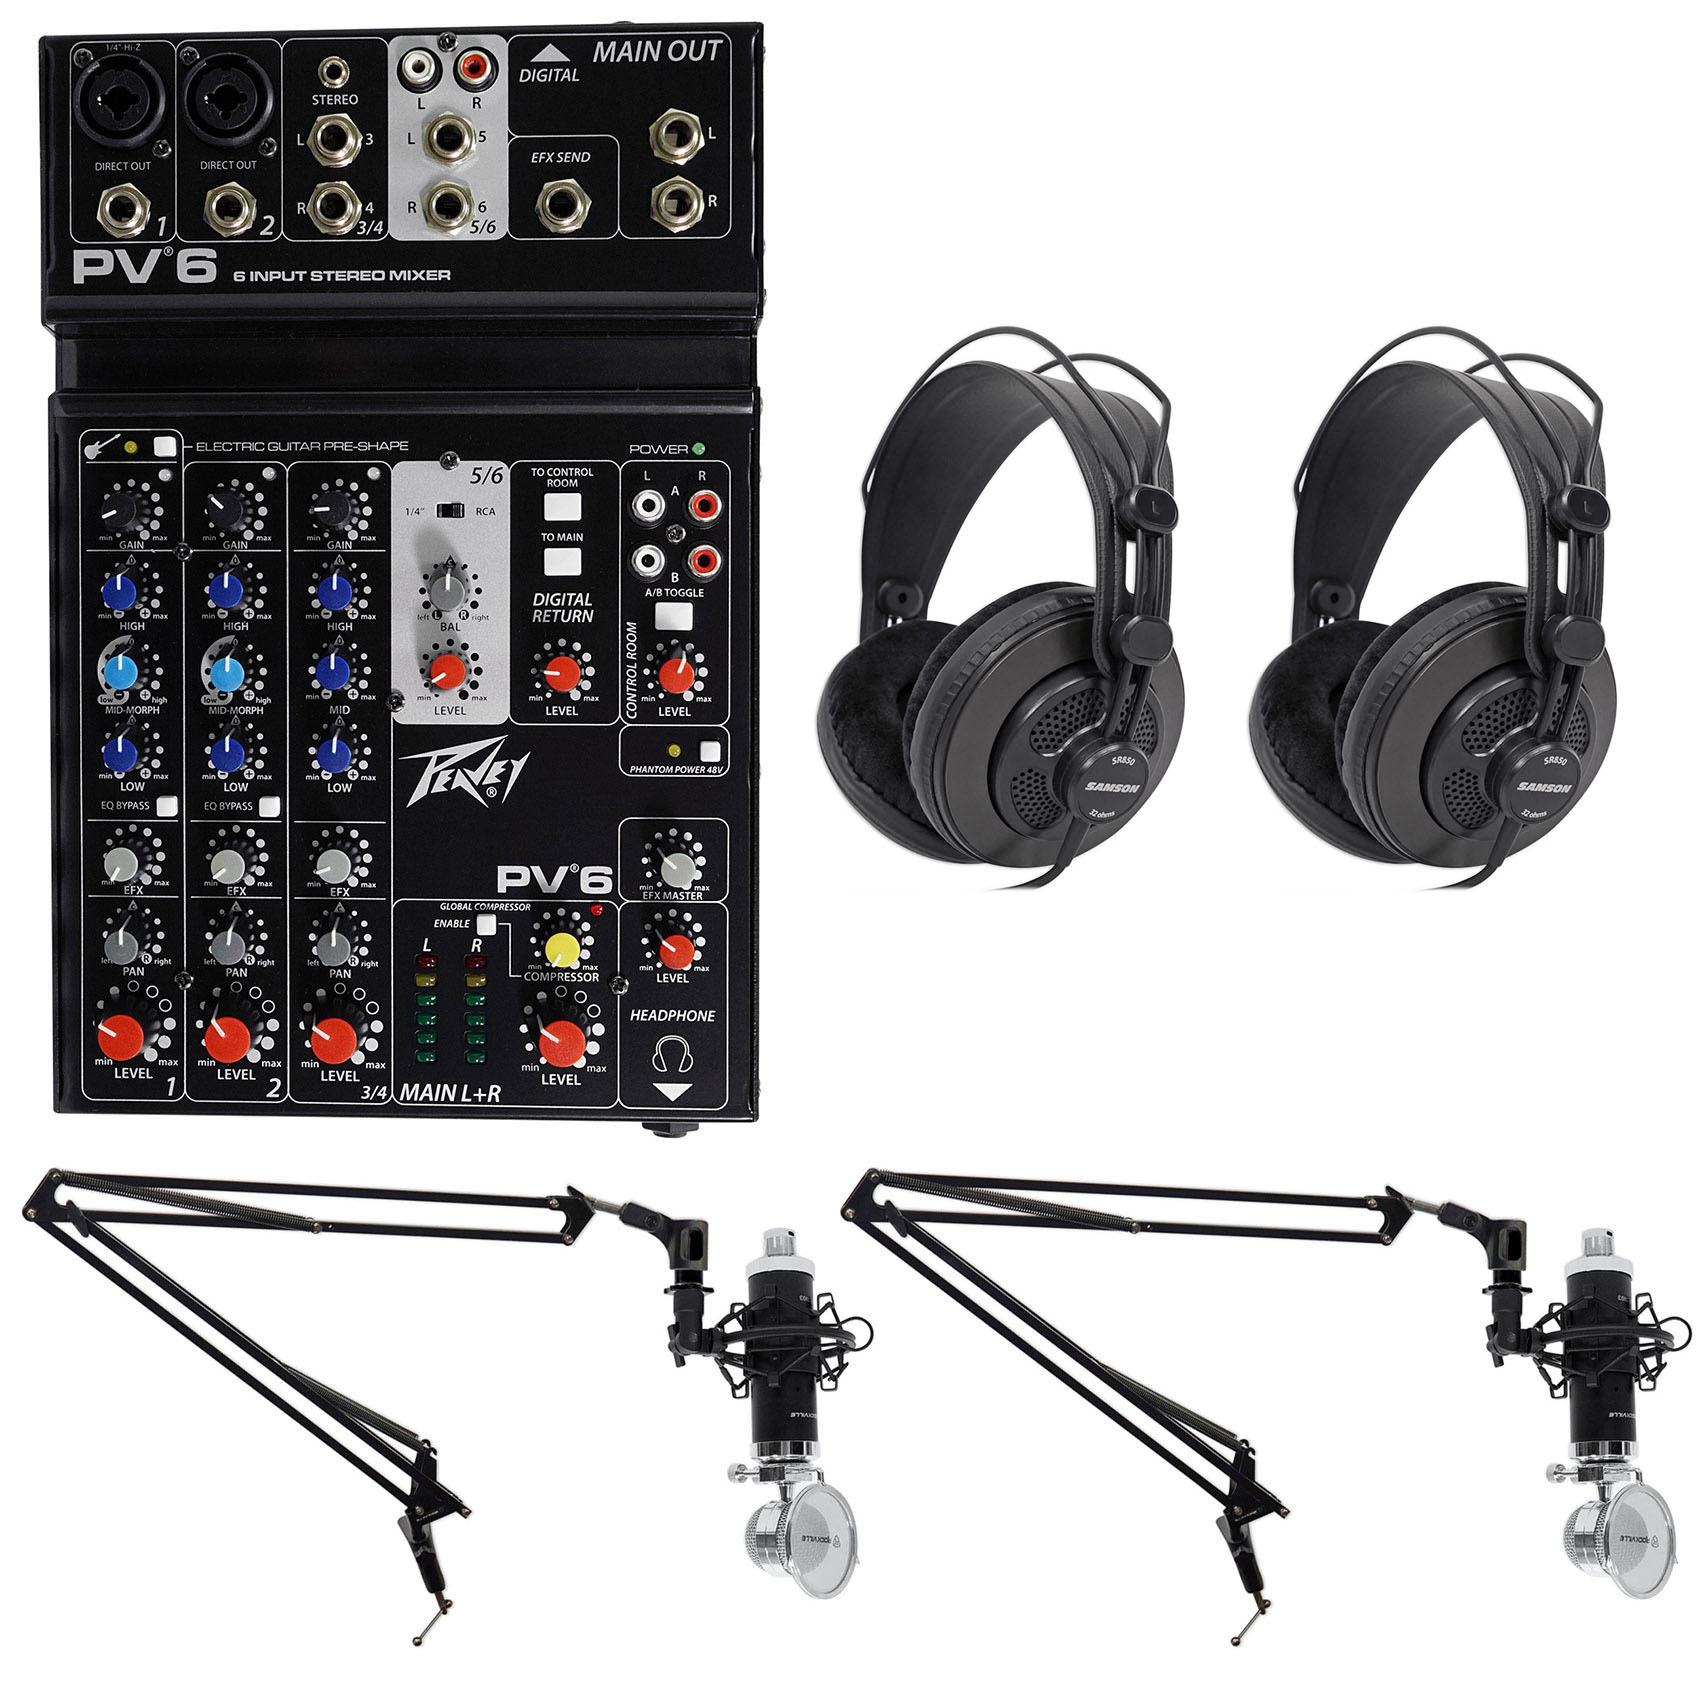 Podcasting Podcast Recording Bundle w/Peavey Mixer+(2) Headphones+(2) Mic+Booms